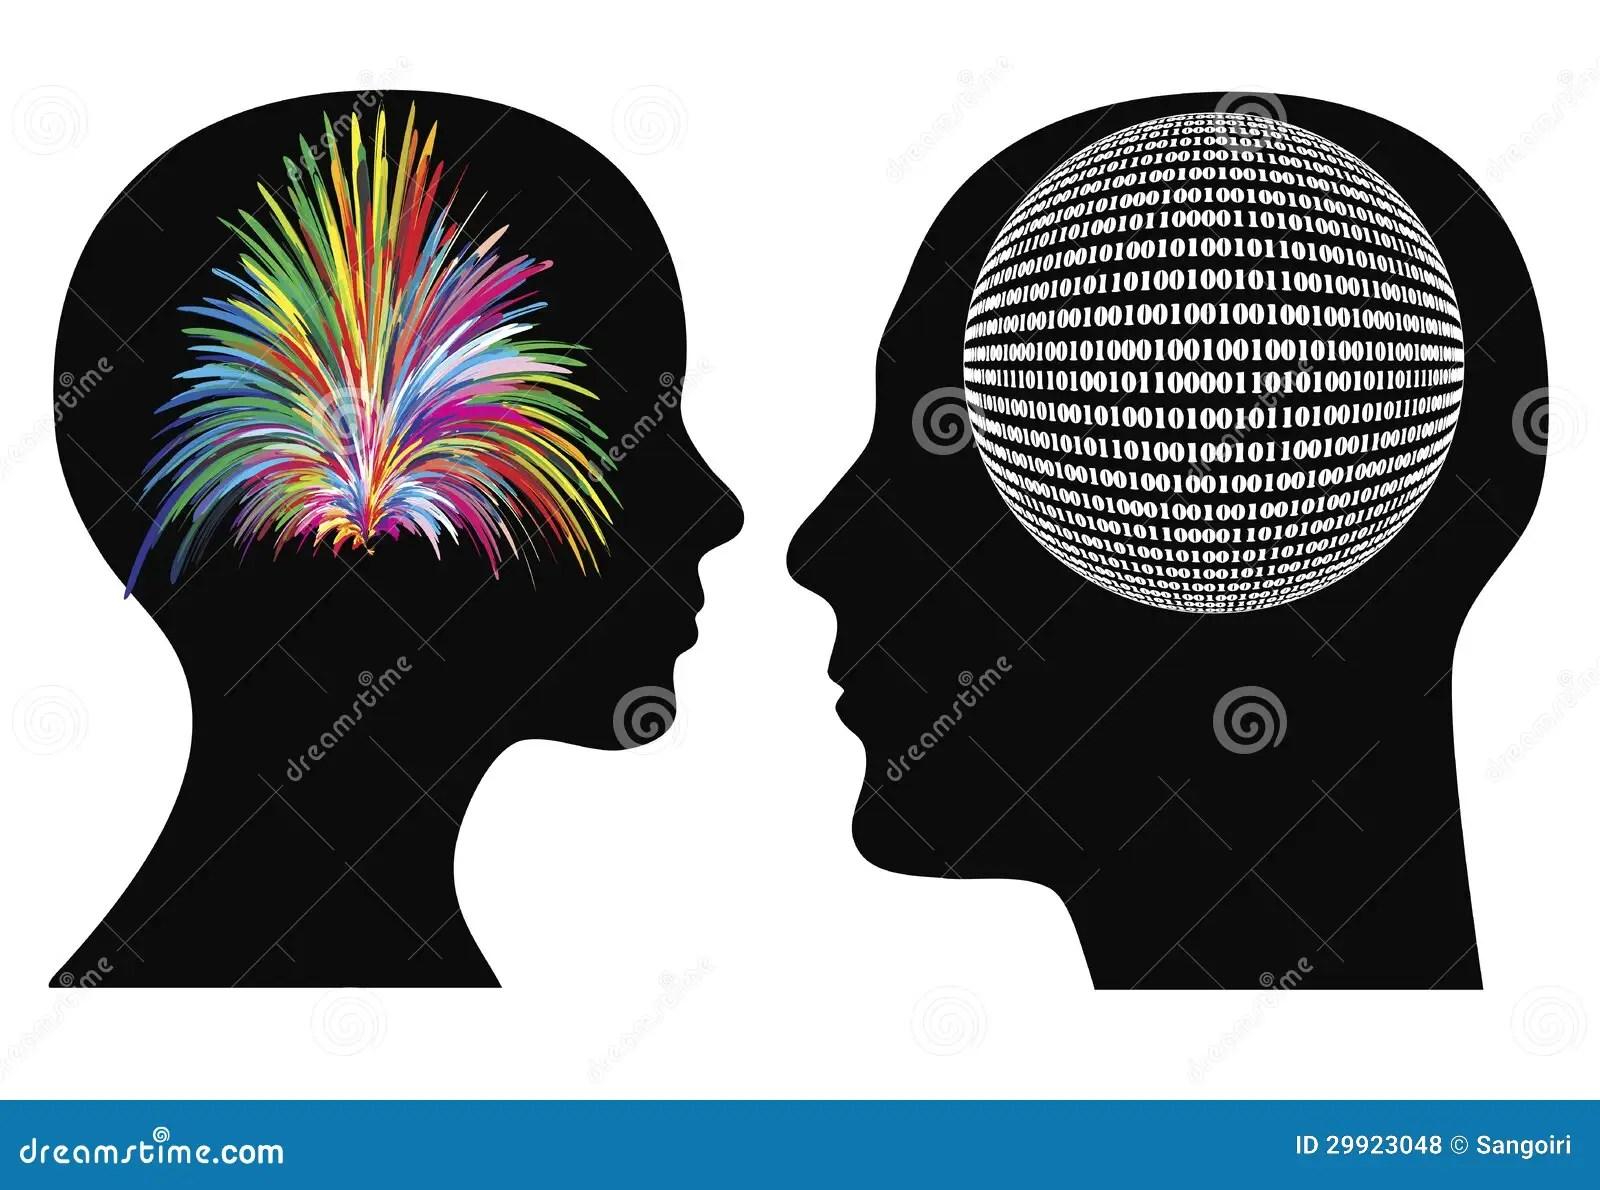 Different Ways Of Thinking Stock Vector Illustration Of Brain